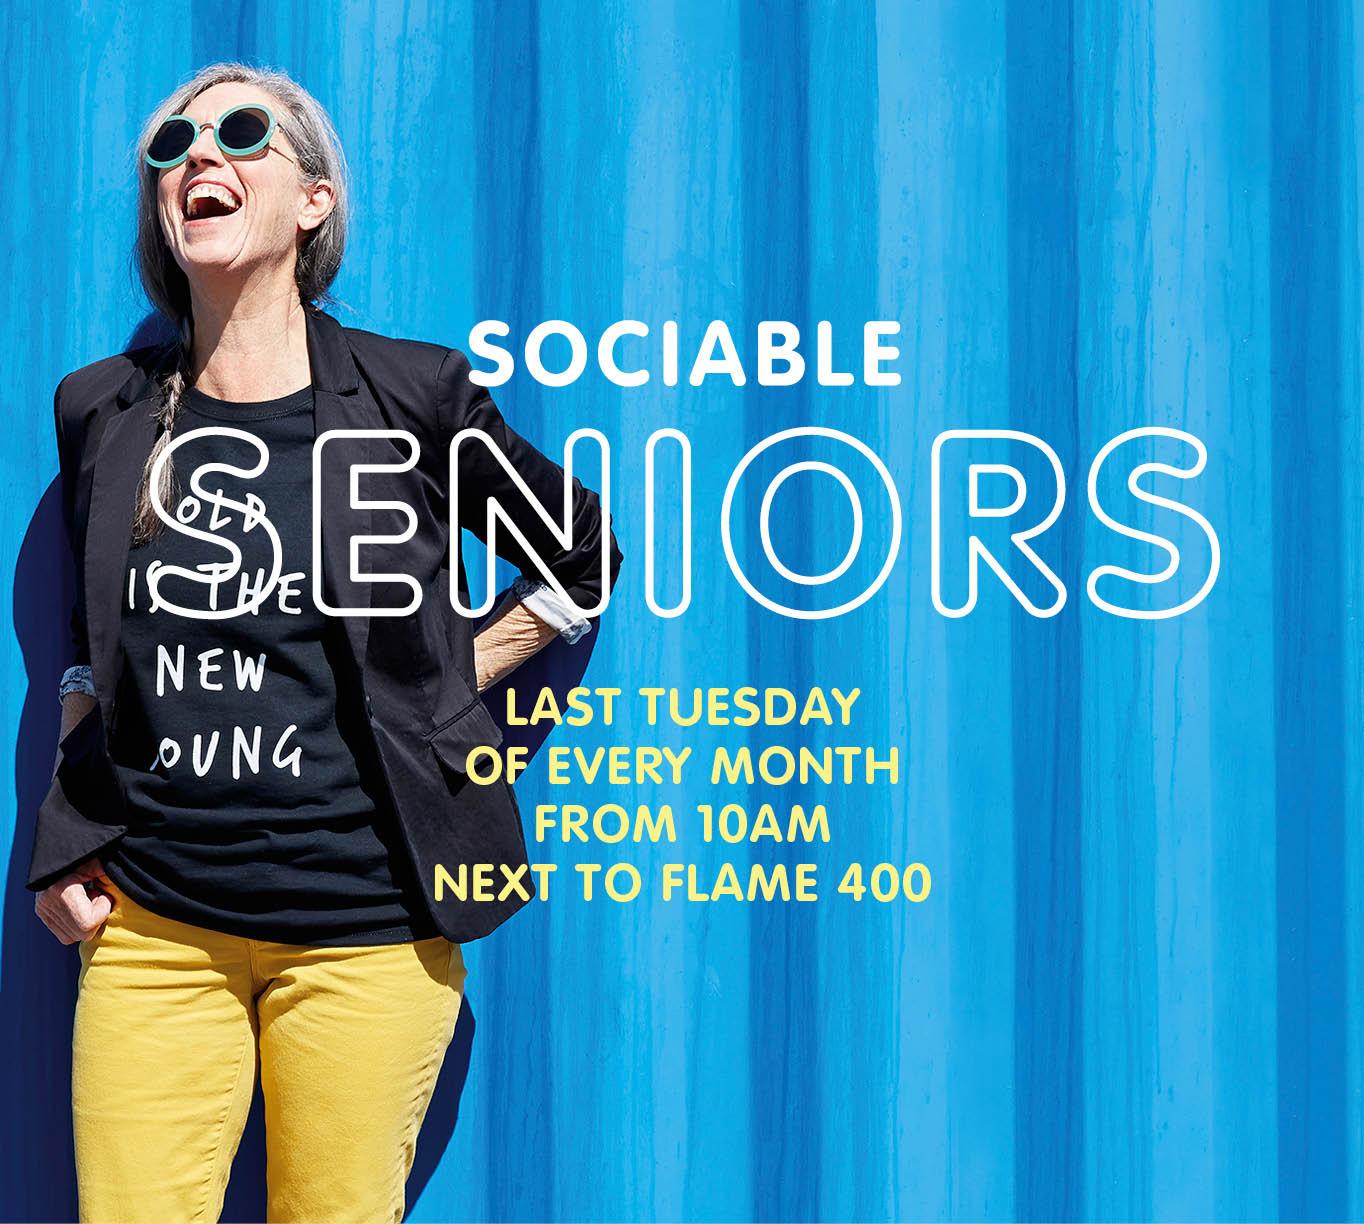 CH4878_Charter Hall_Wanneroo_Sociable Seniors Activation_webtiles_@2-682x612